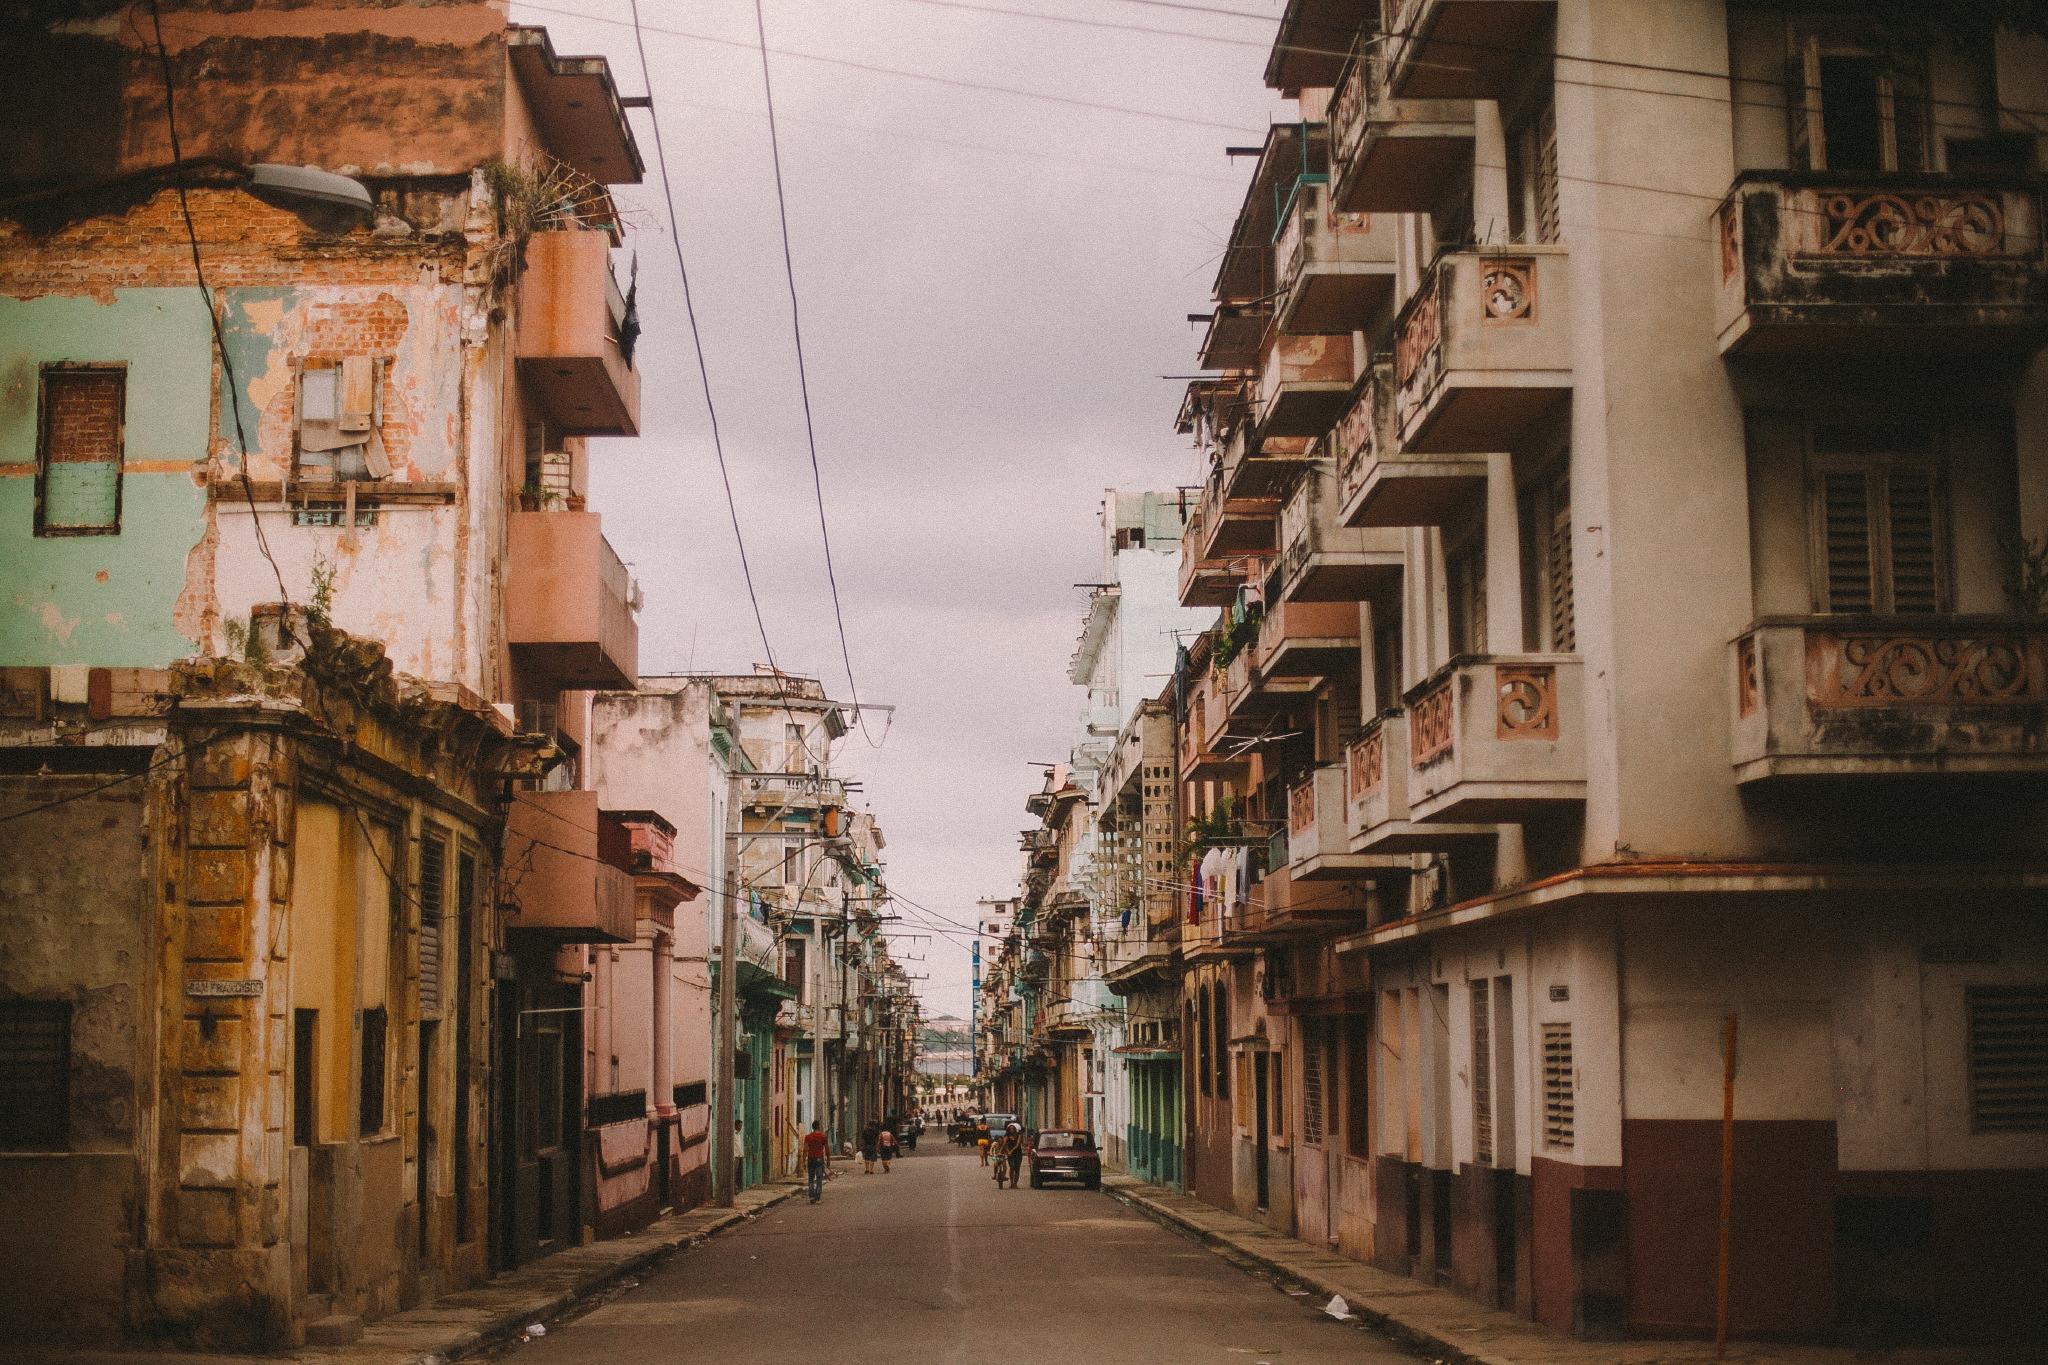 san diego wedding   photographer | urban residential street in cuba